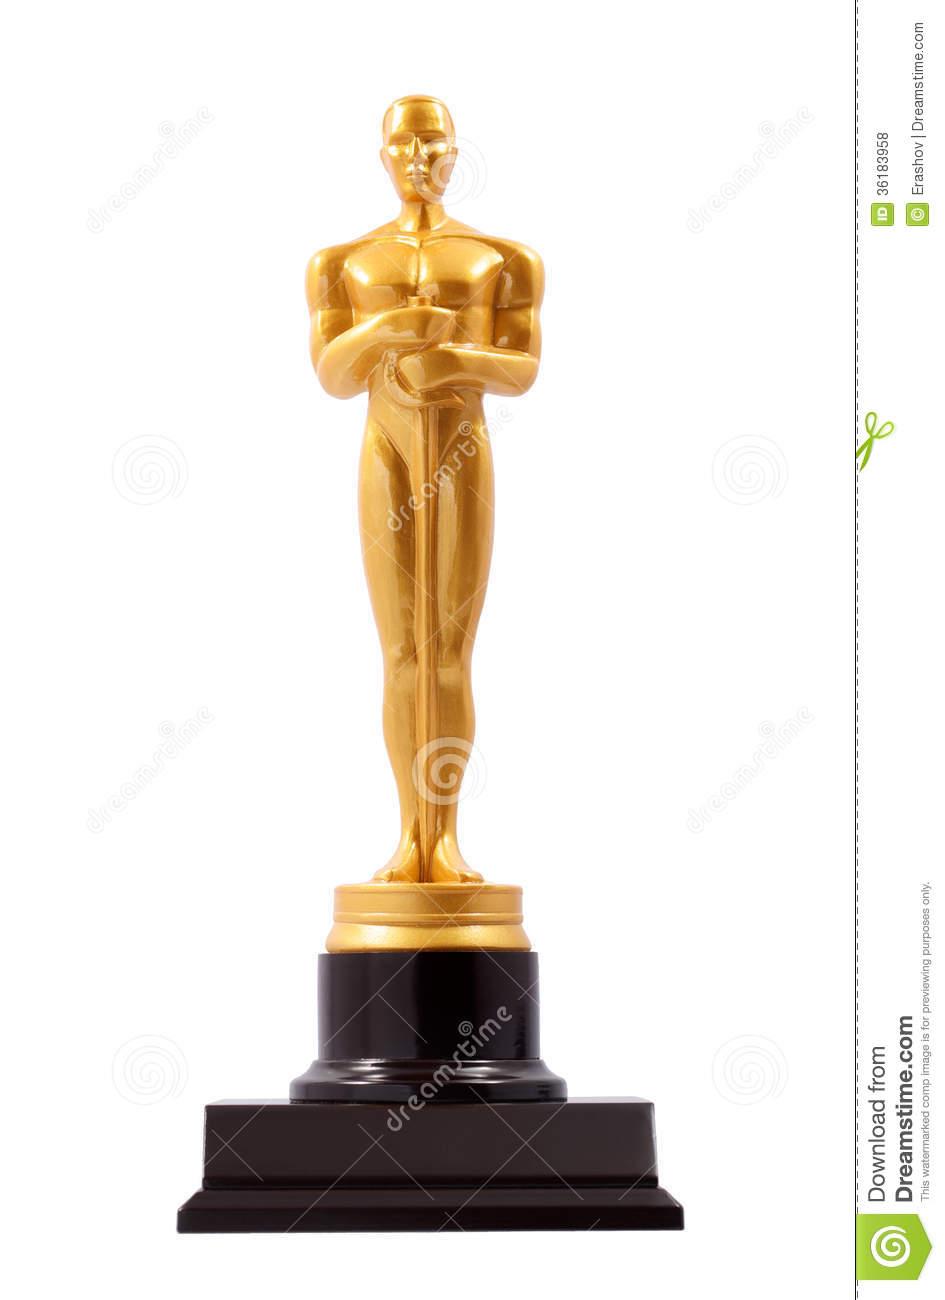 Gold Statue Clipart.